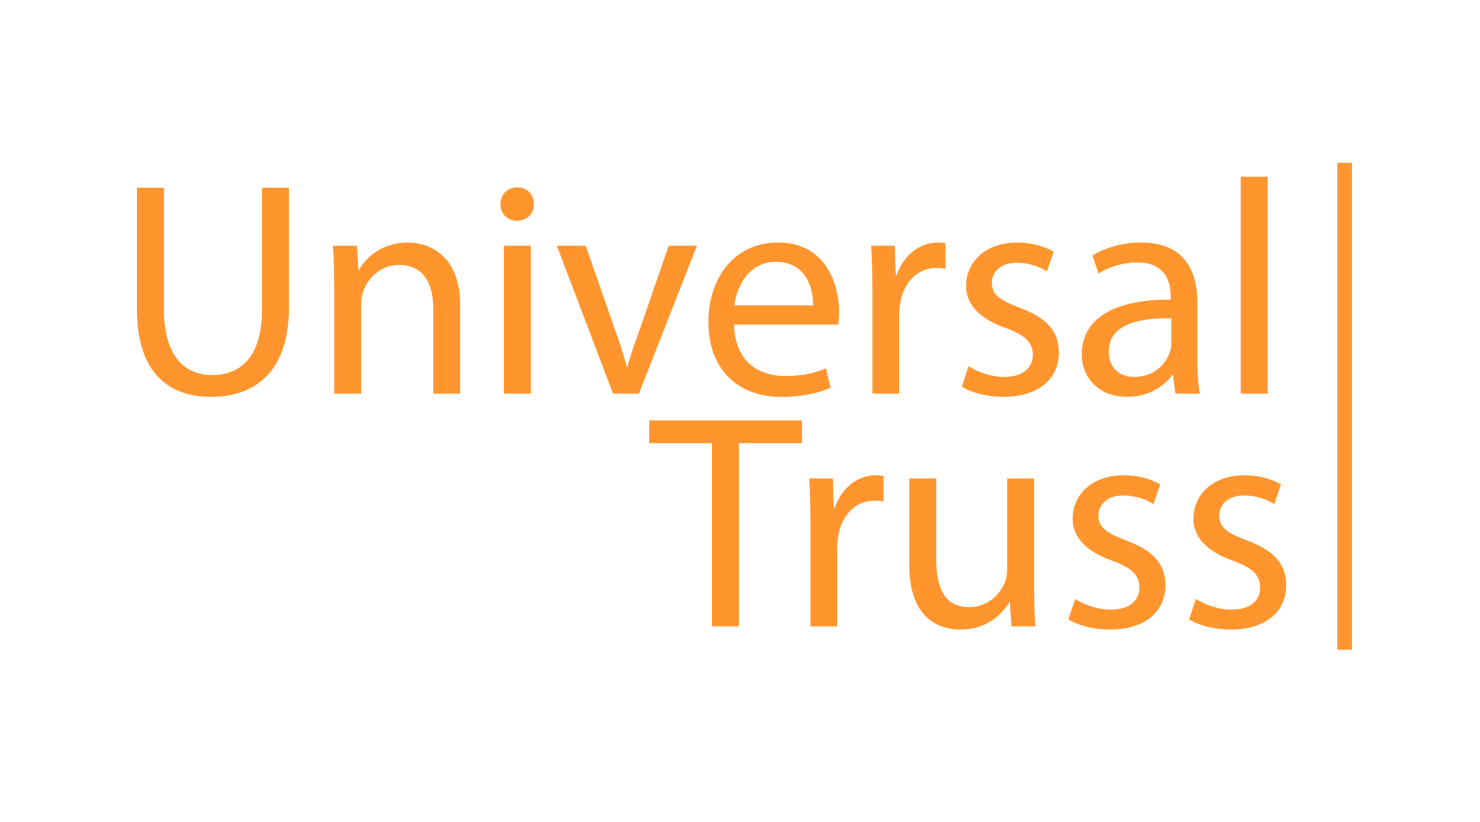 Universal Truss